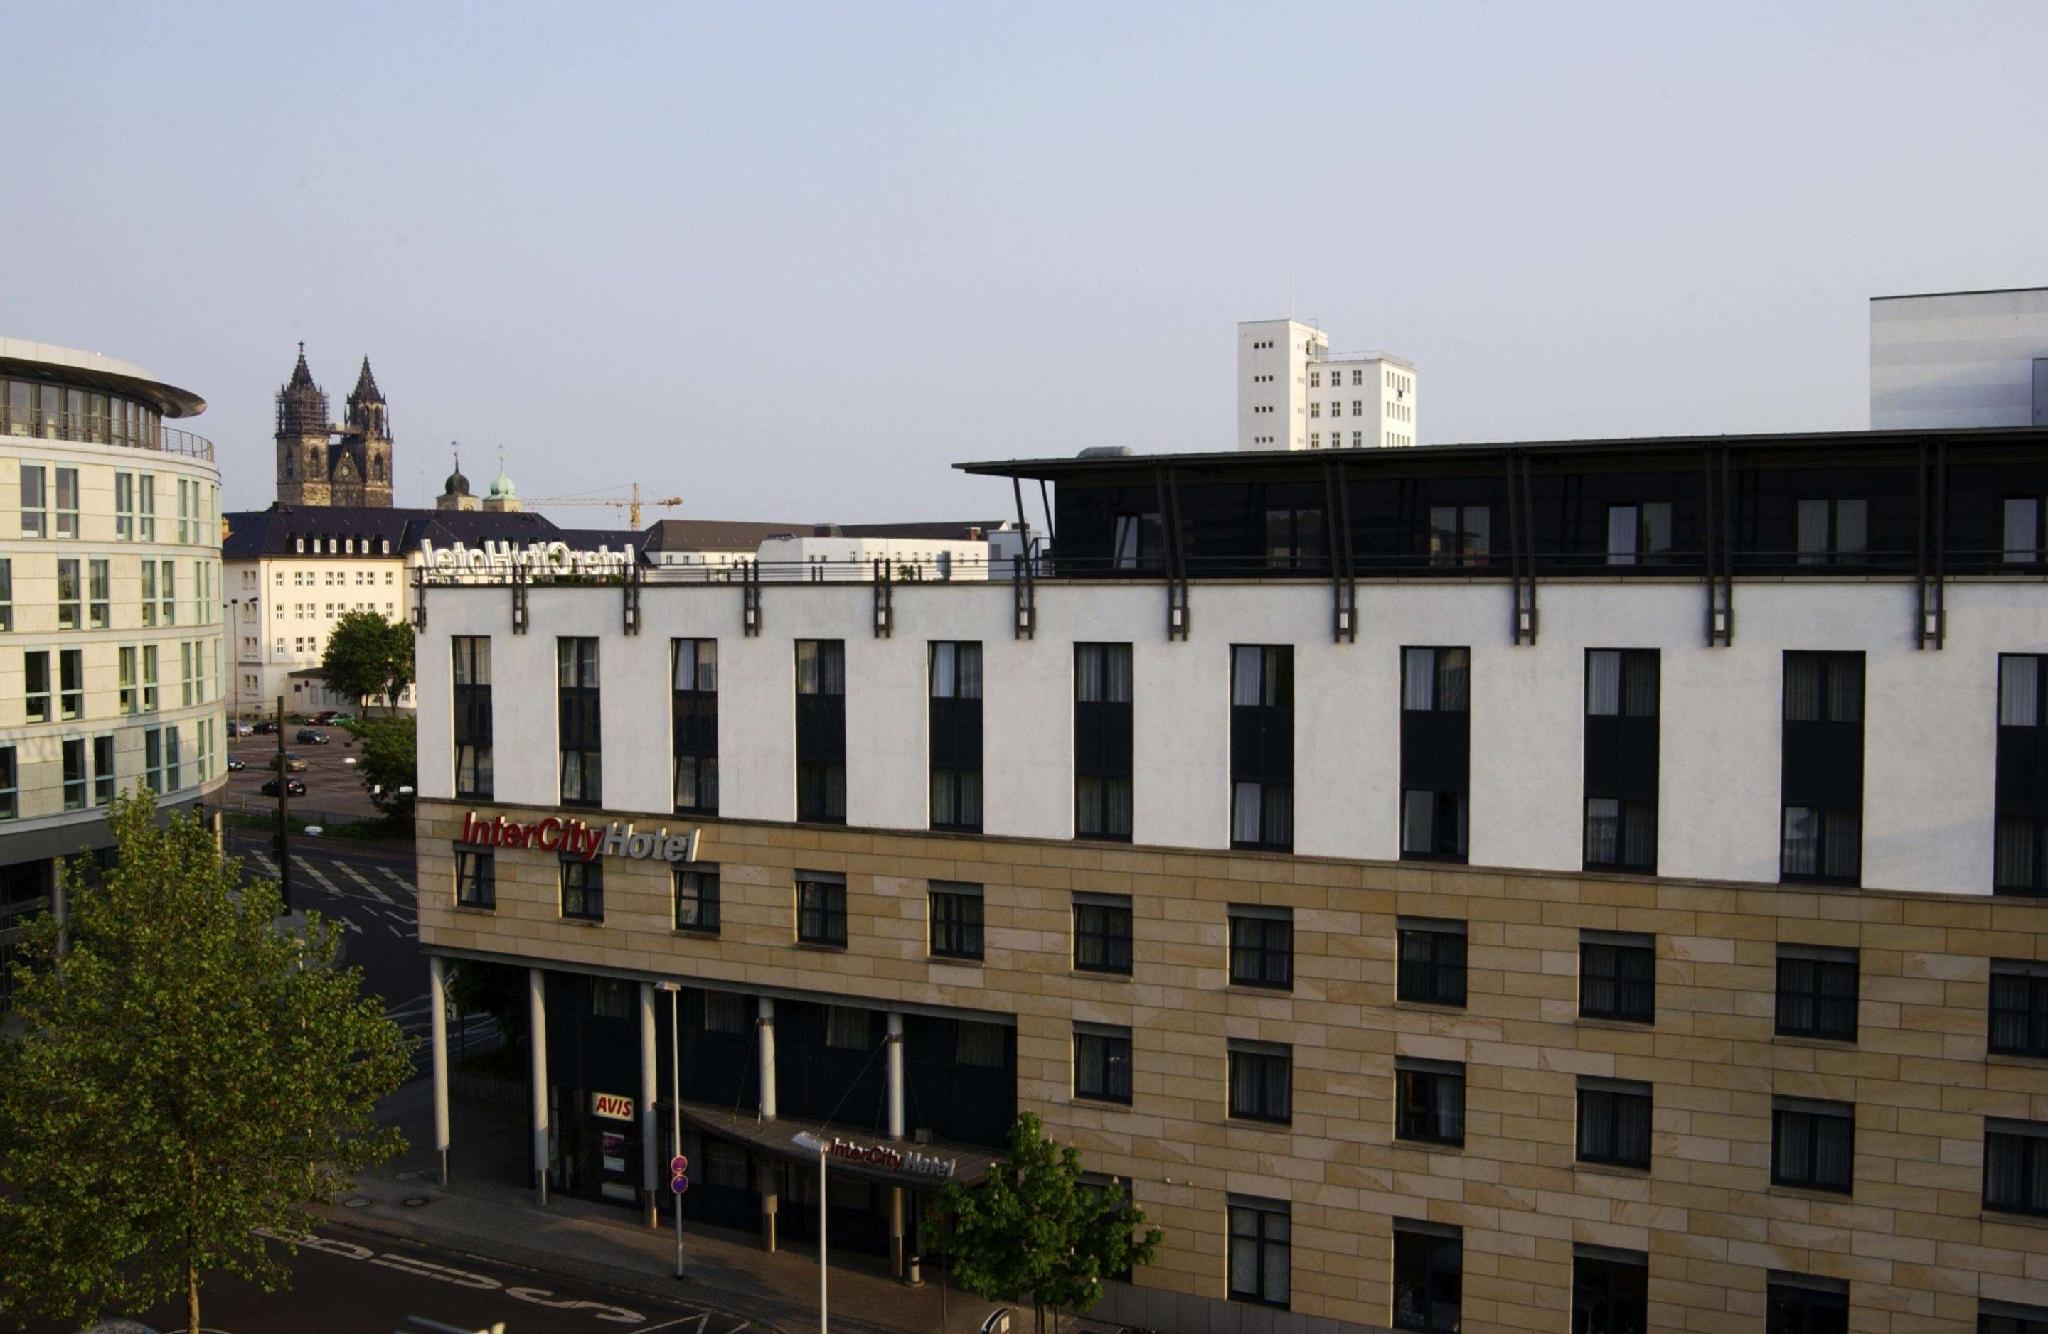 IntercityHotel Magdeburg, Magdeburg